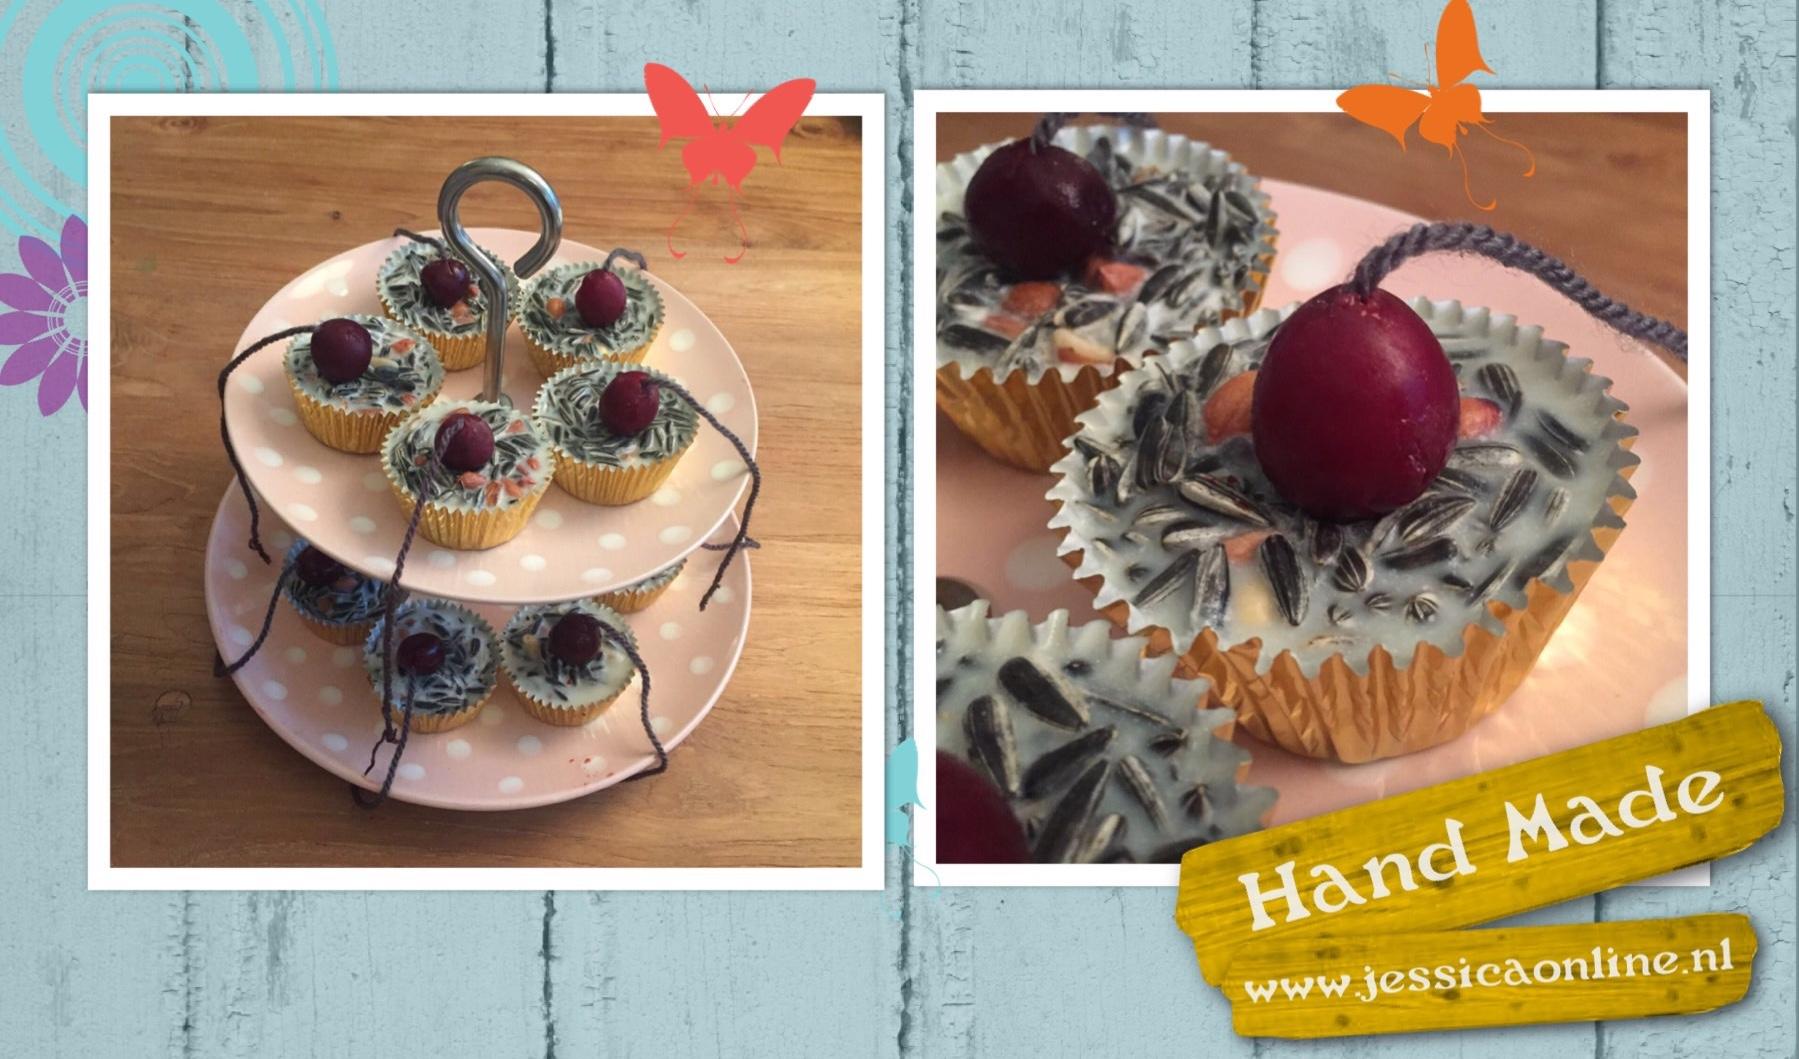 Birdy cakes